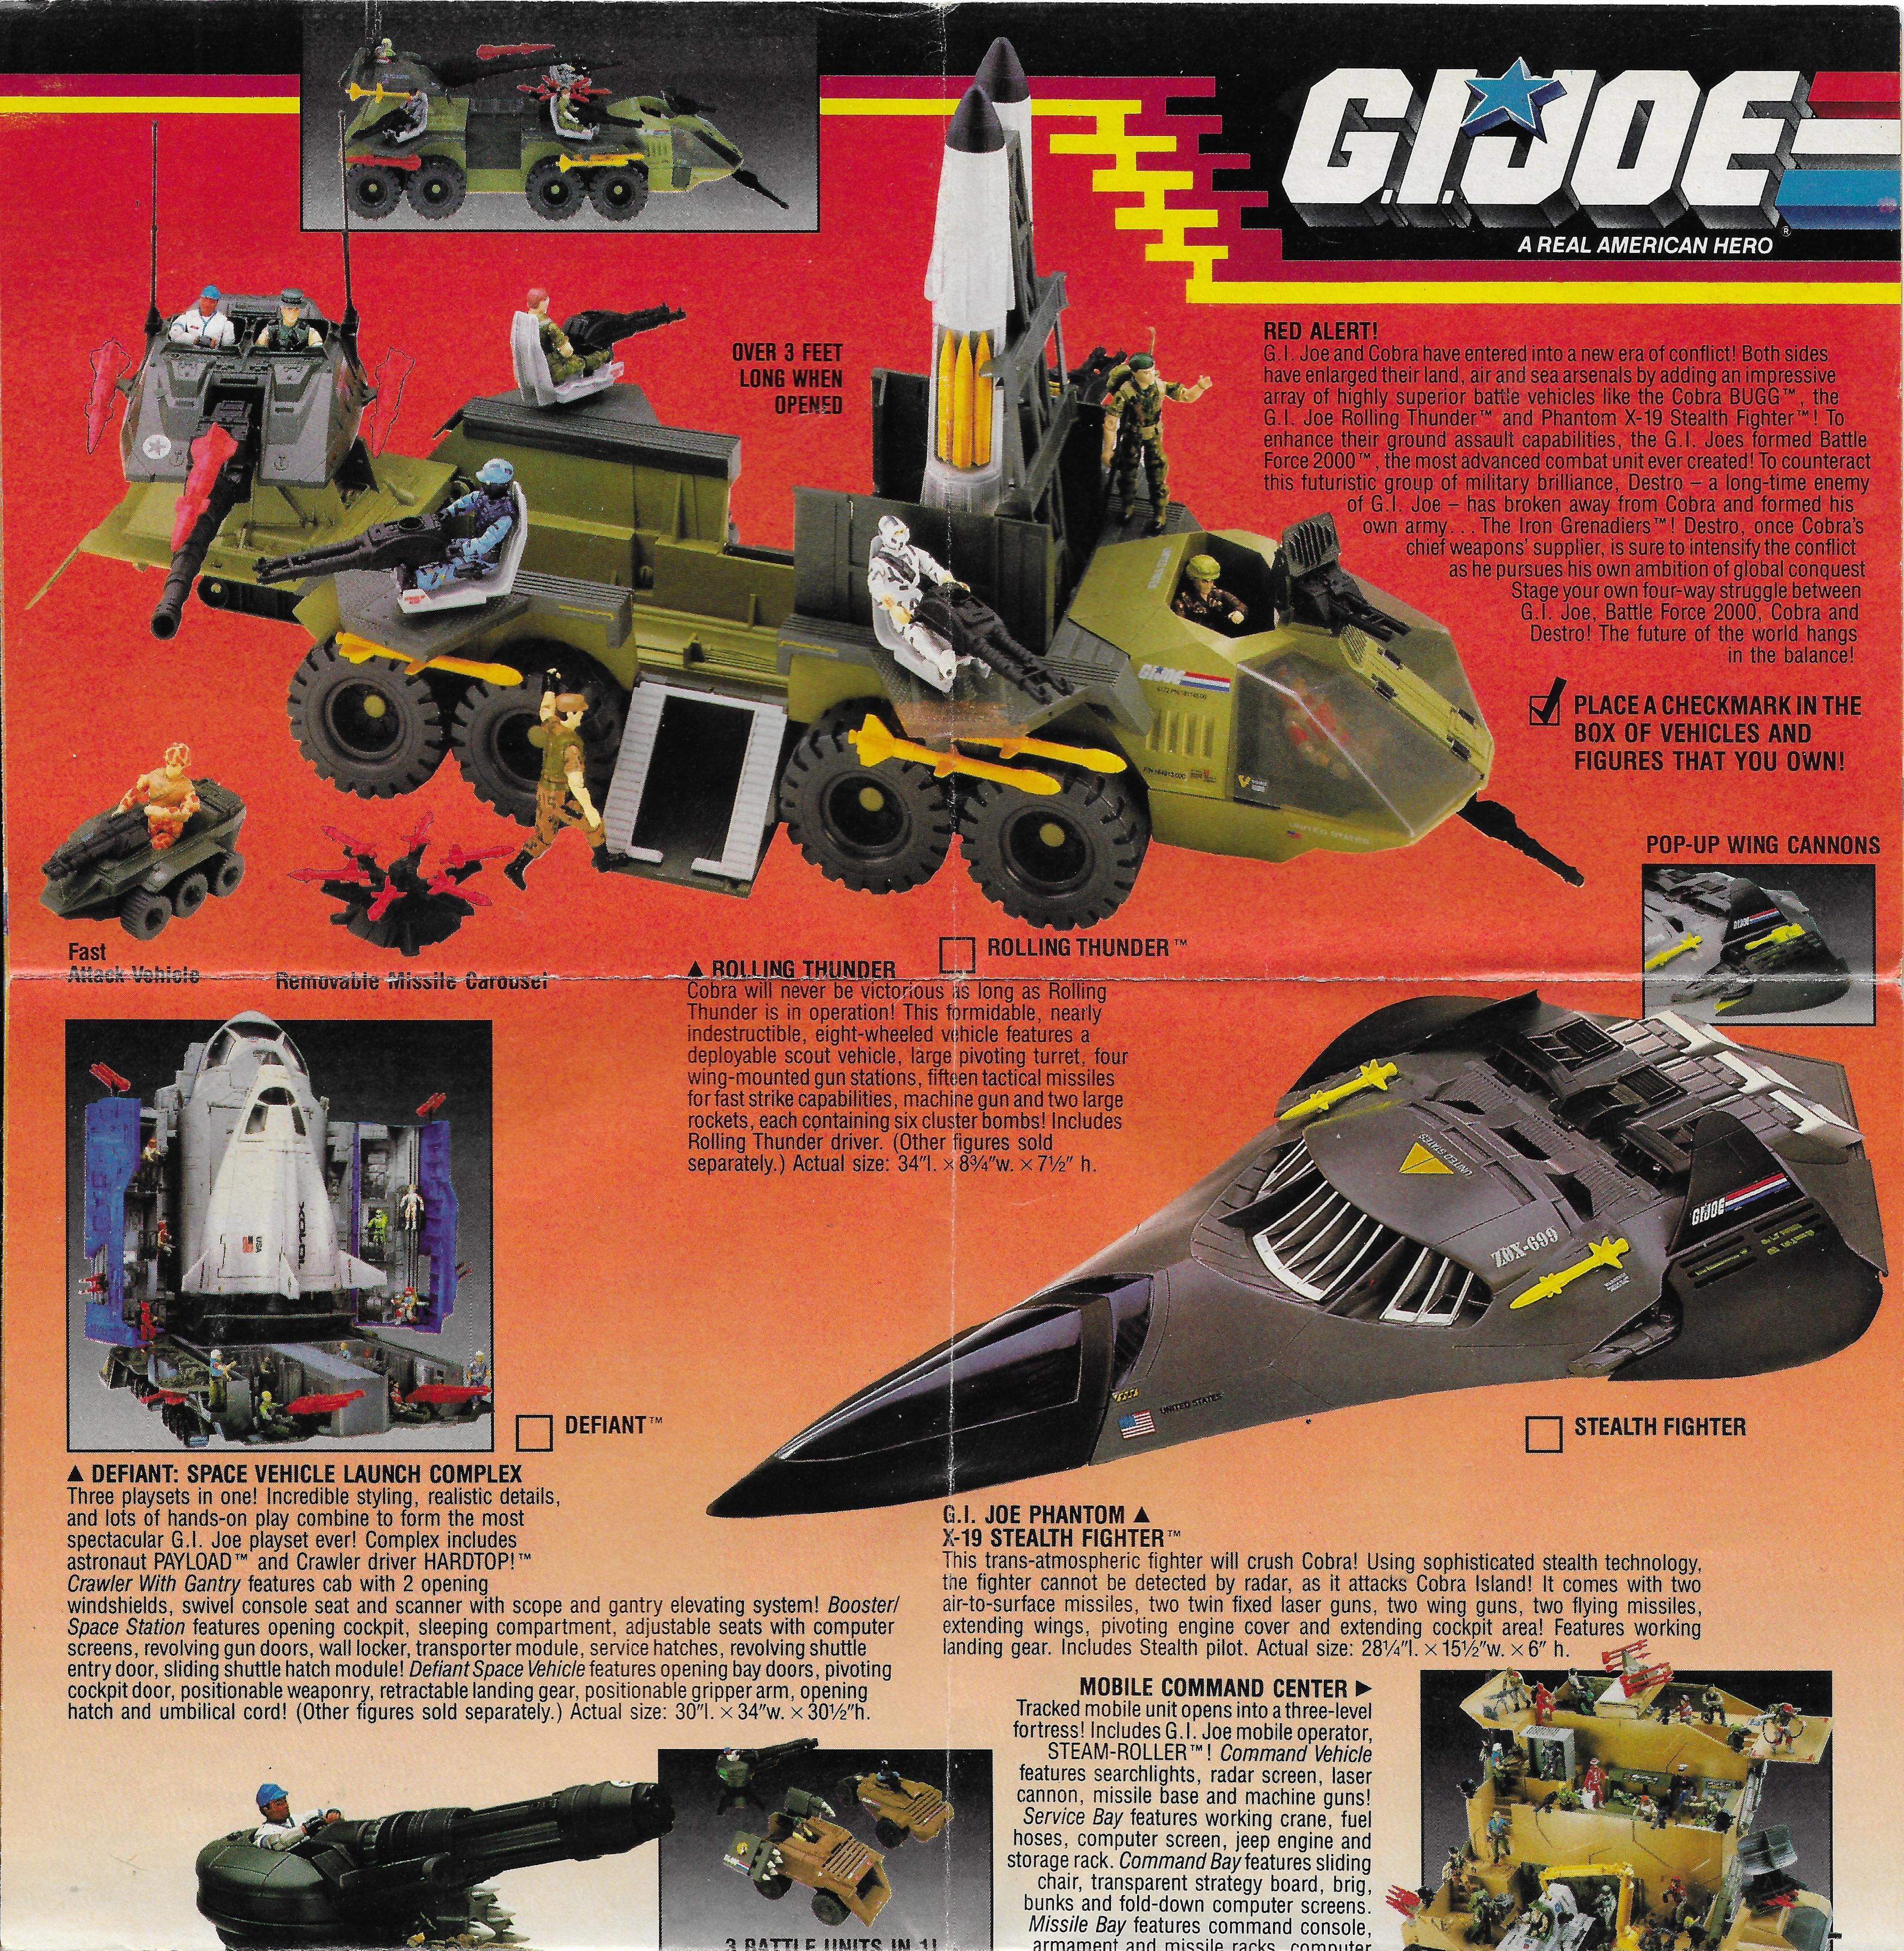 1988-as amerikai G.I.Joe katalógus